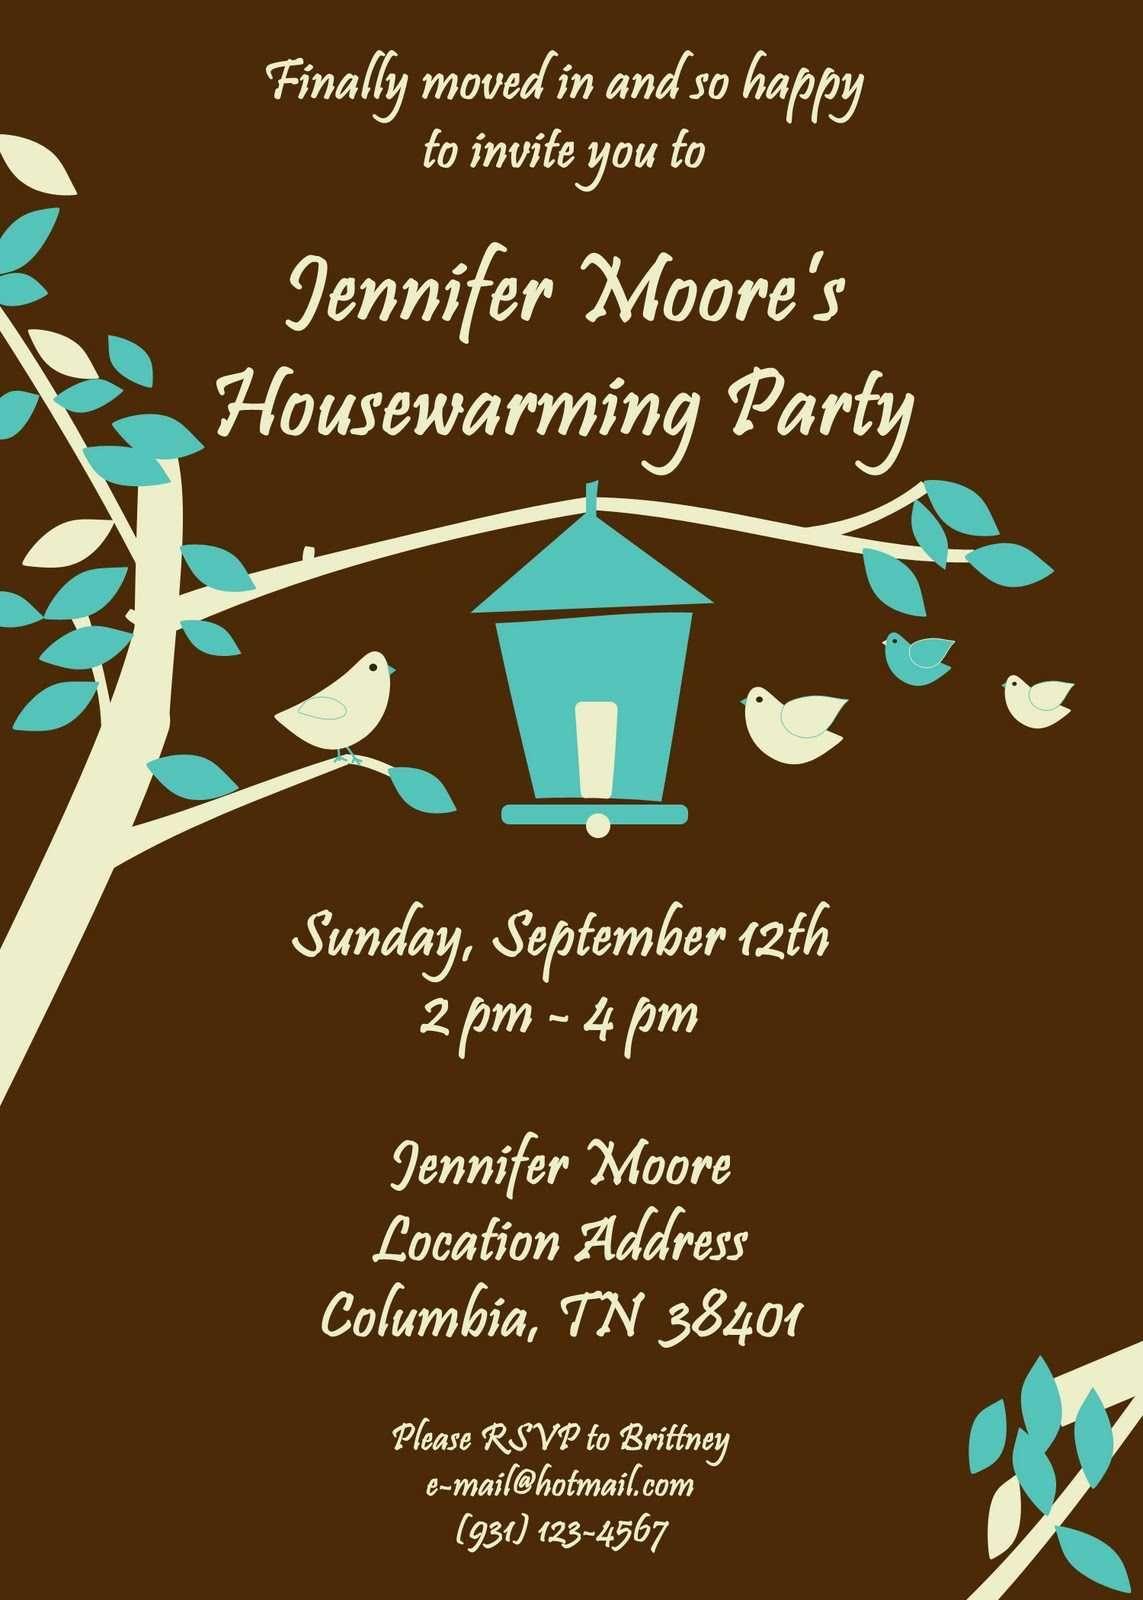 housewarming party invitations cute birdhouse theme | Housewarming ...